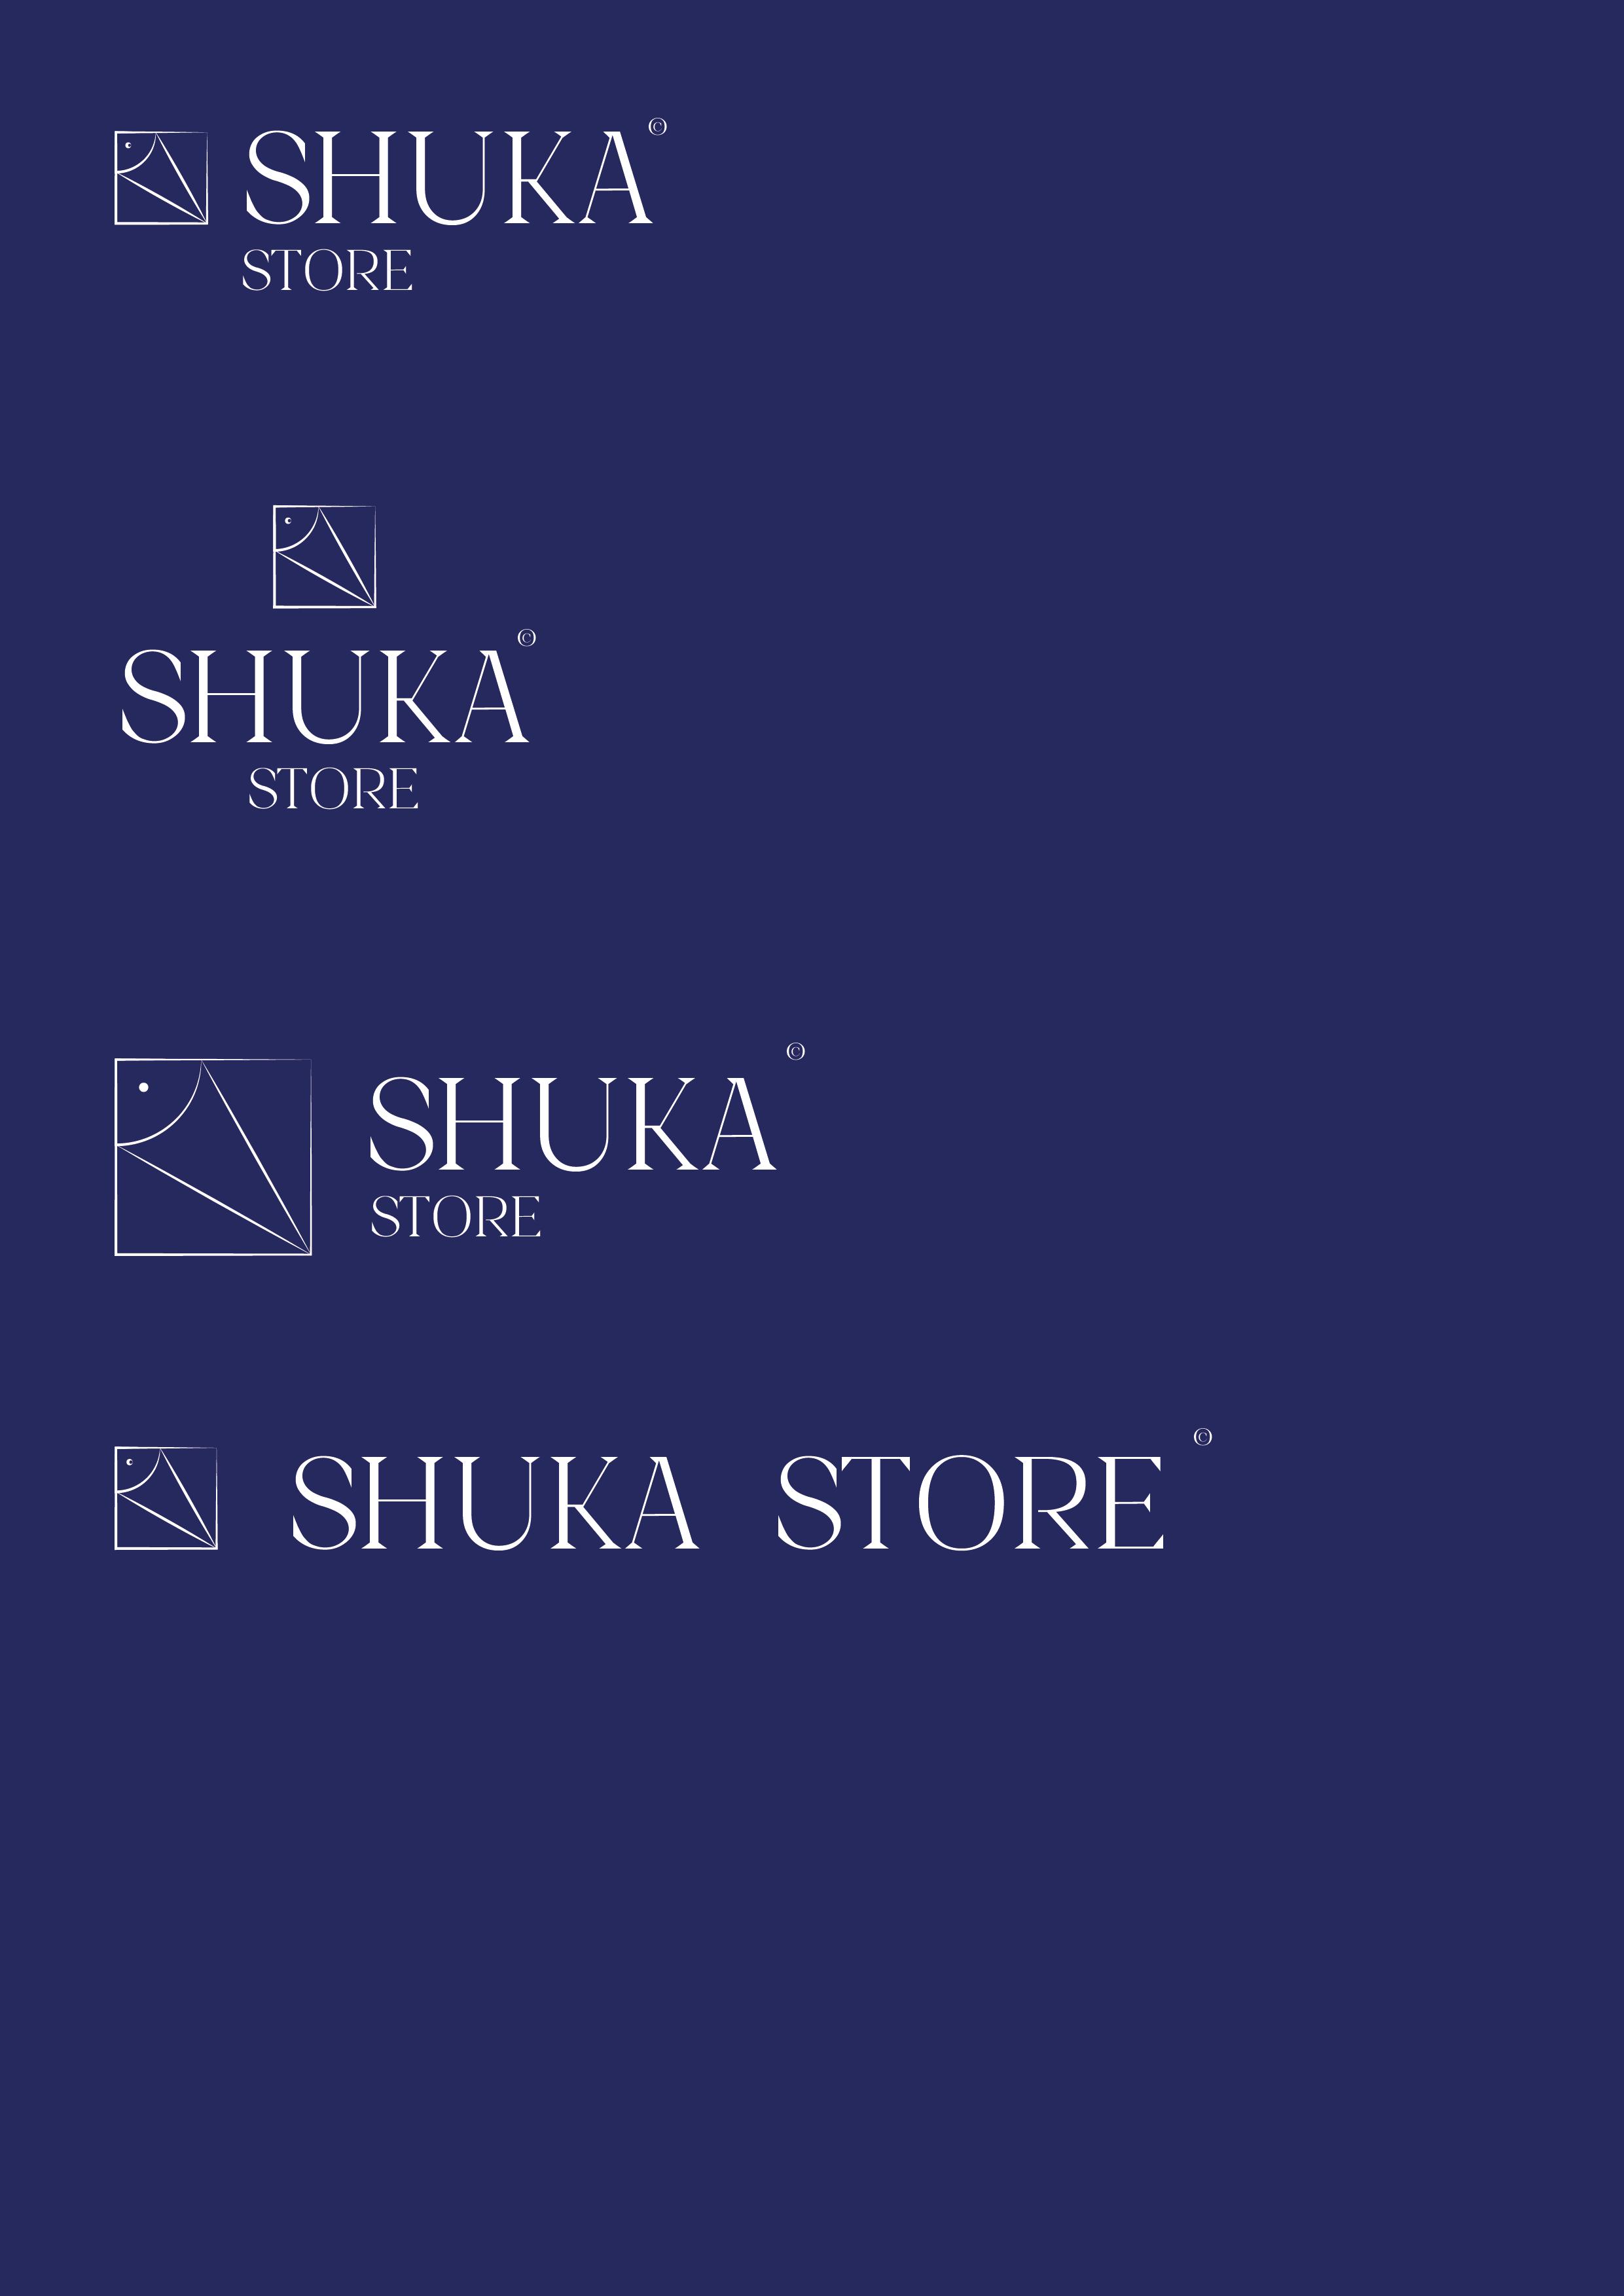 Разработка логотипа бренда молодежной одежды фото f_7355f22f930d273c.png